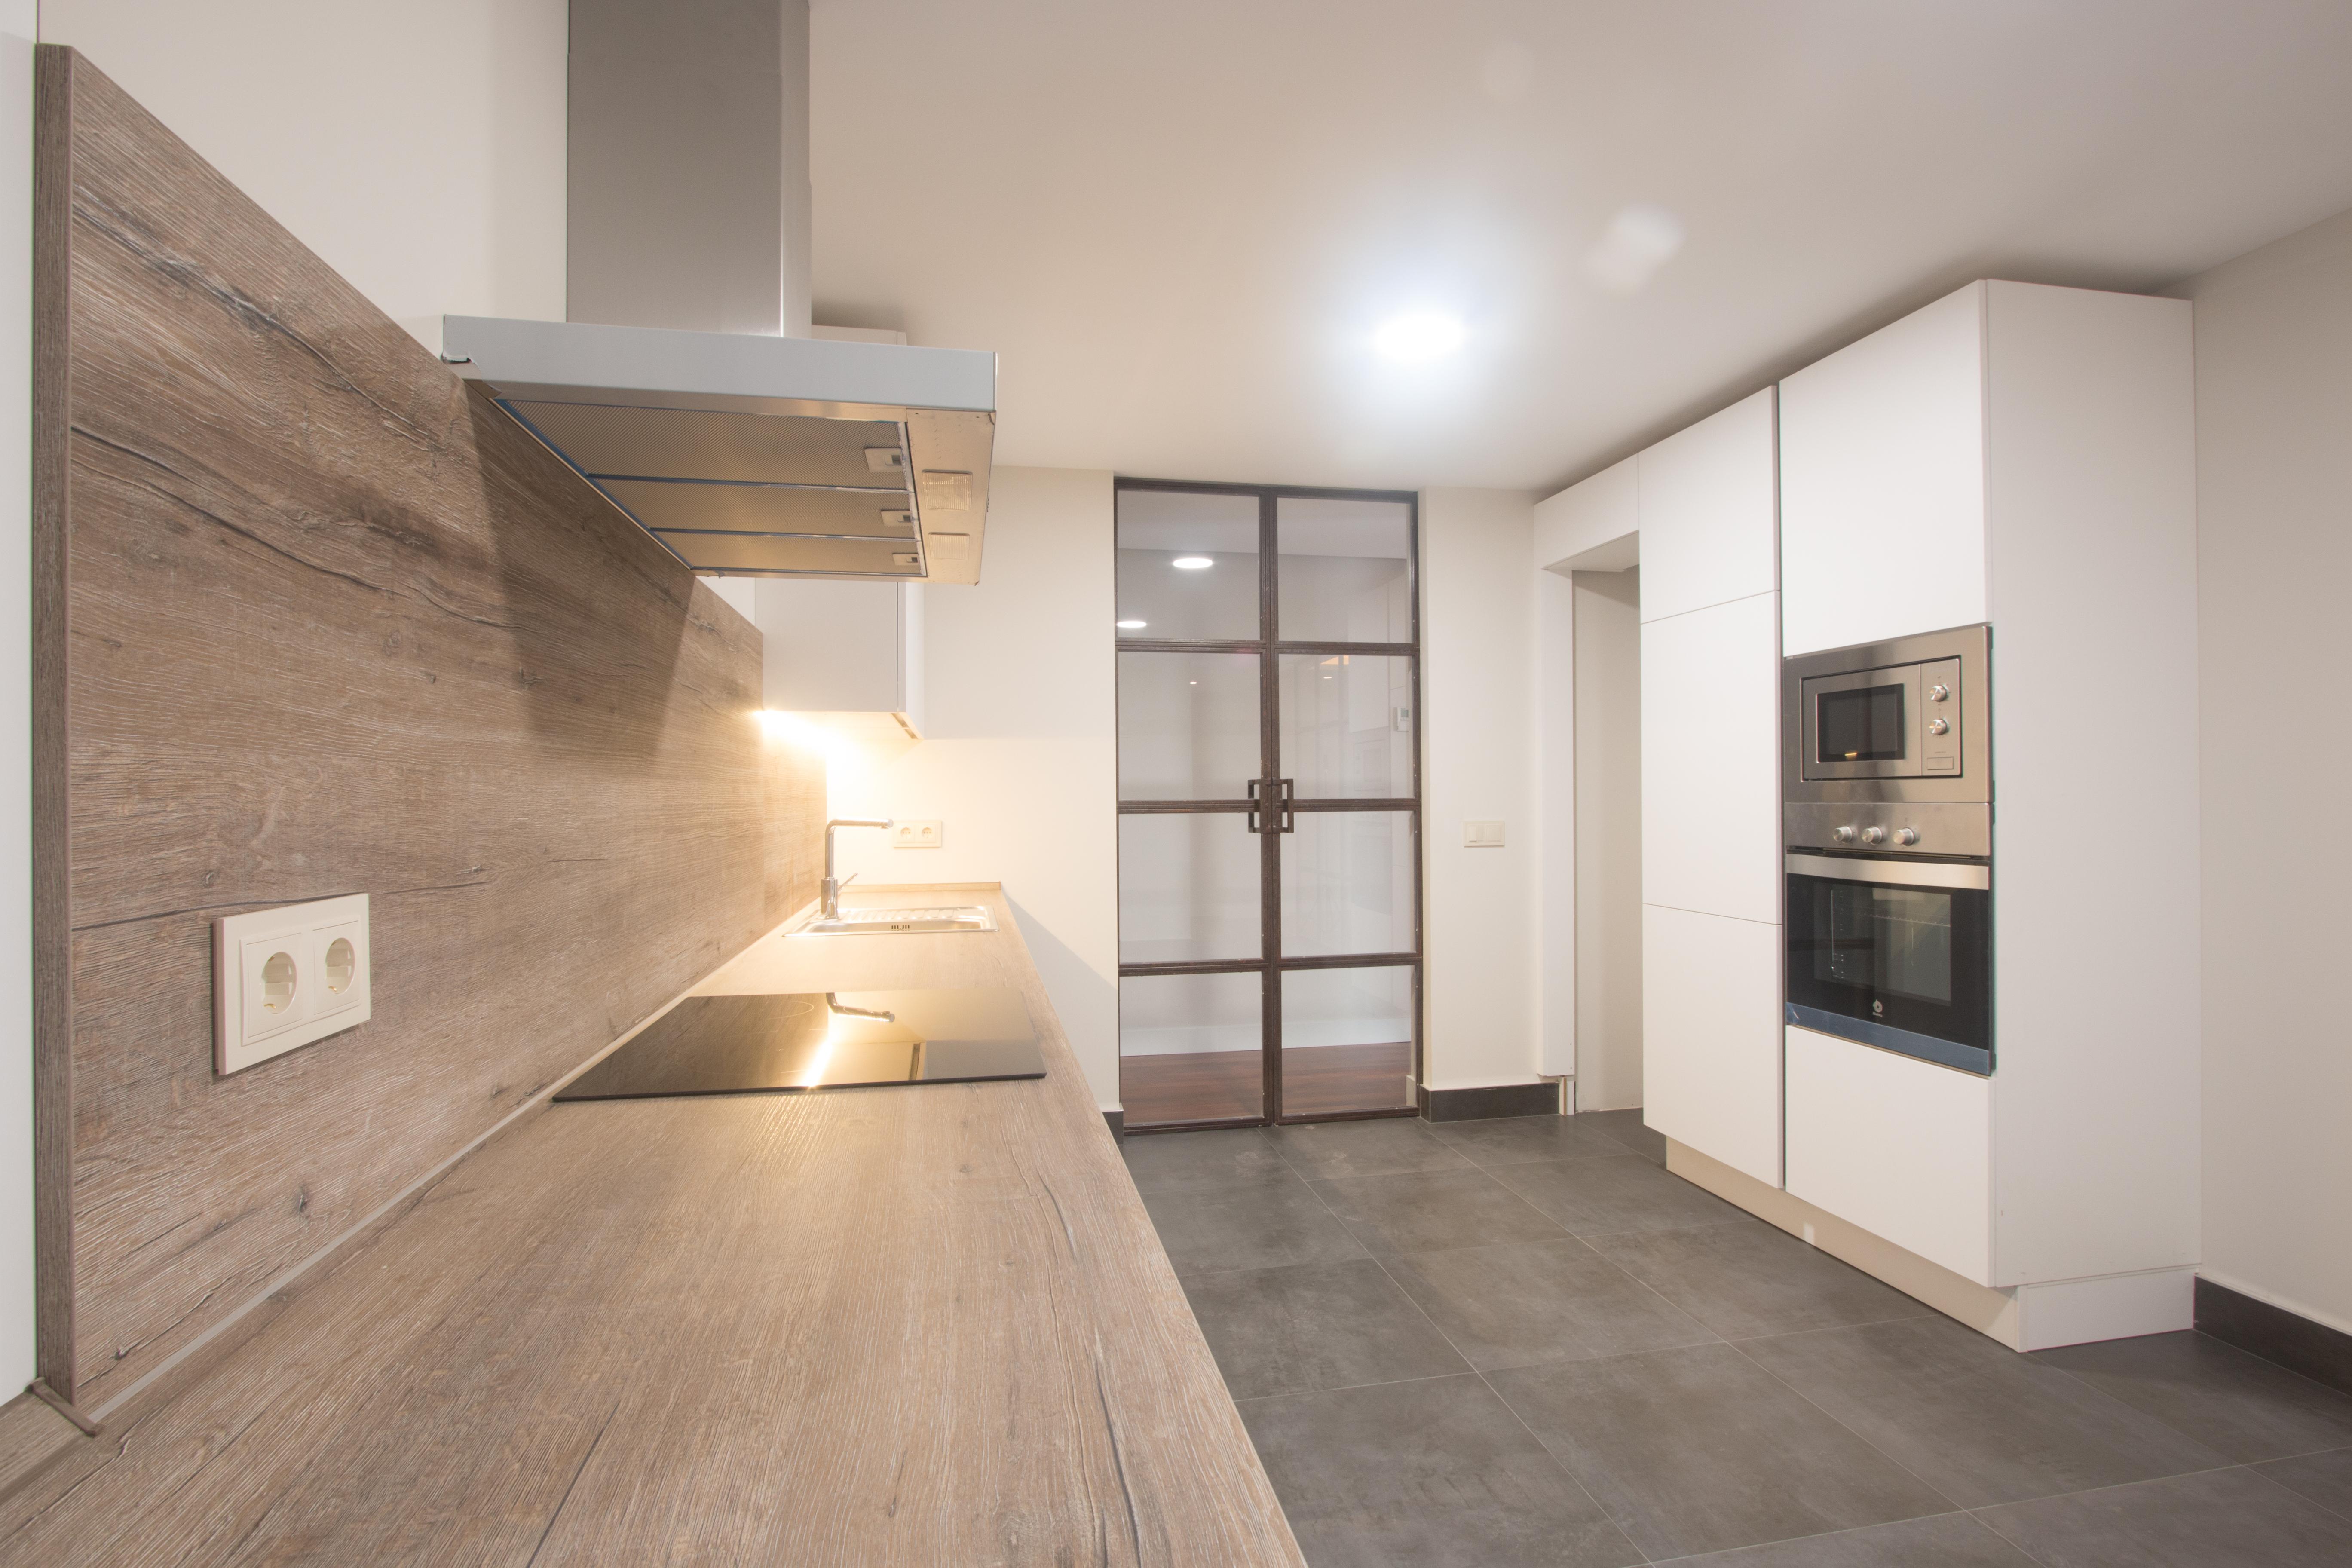 piso con reforma integral de lujo 208 m2 precio On precio m2 reforma integral chalet